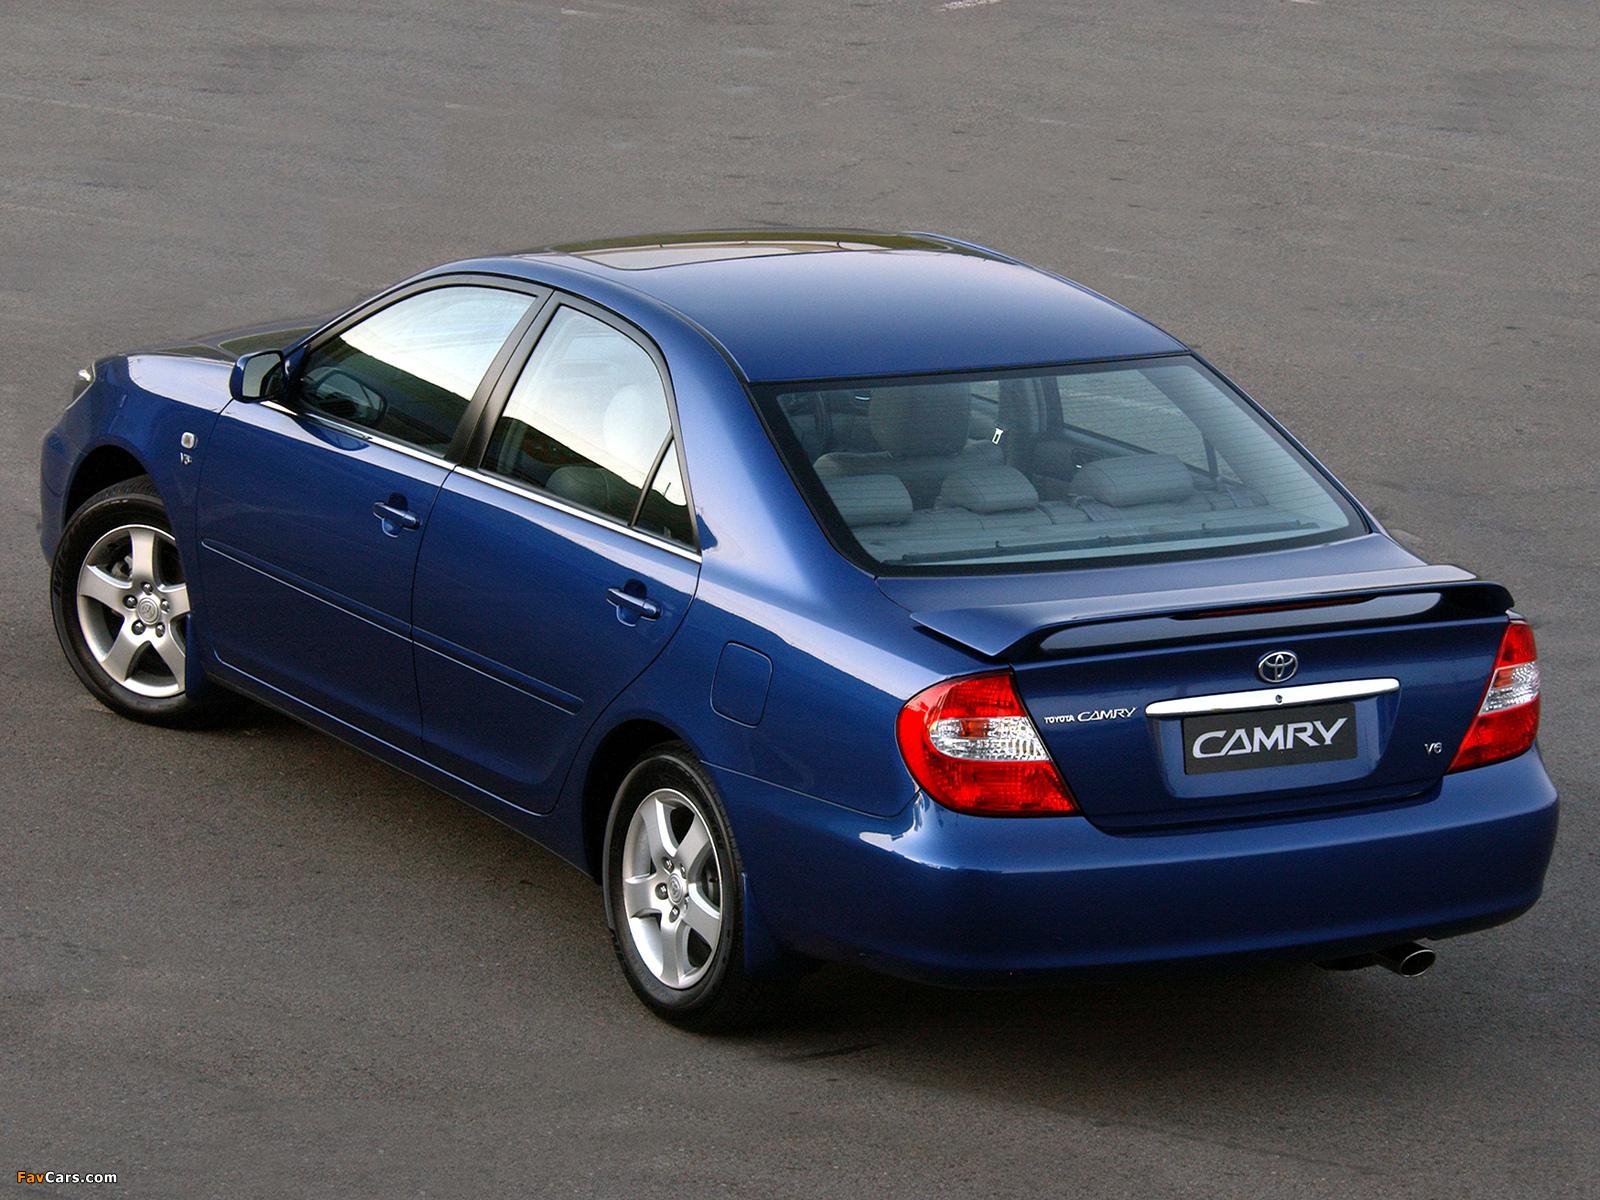 Toyota Camry ACV 30 до и после капремонта двигателя 2AZ-FE